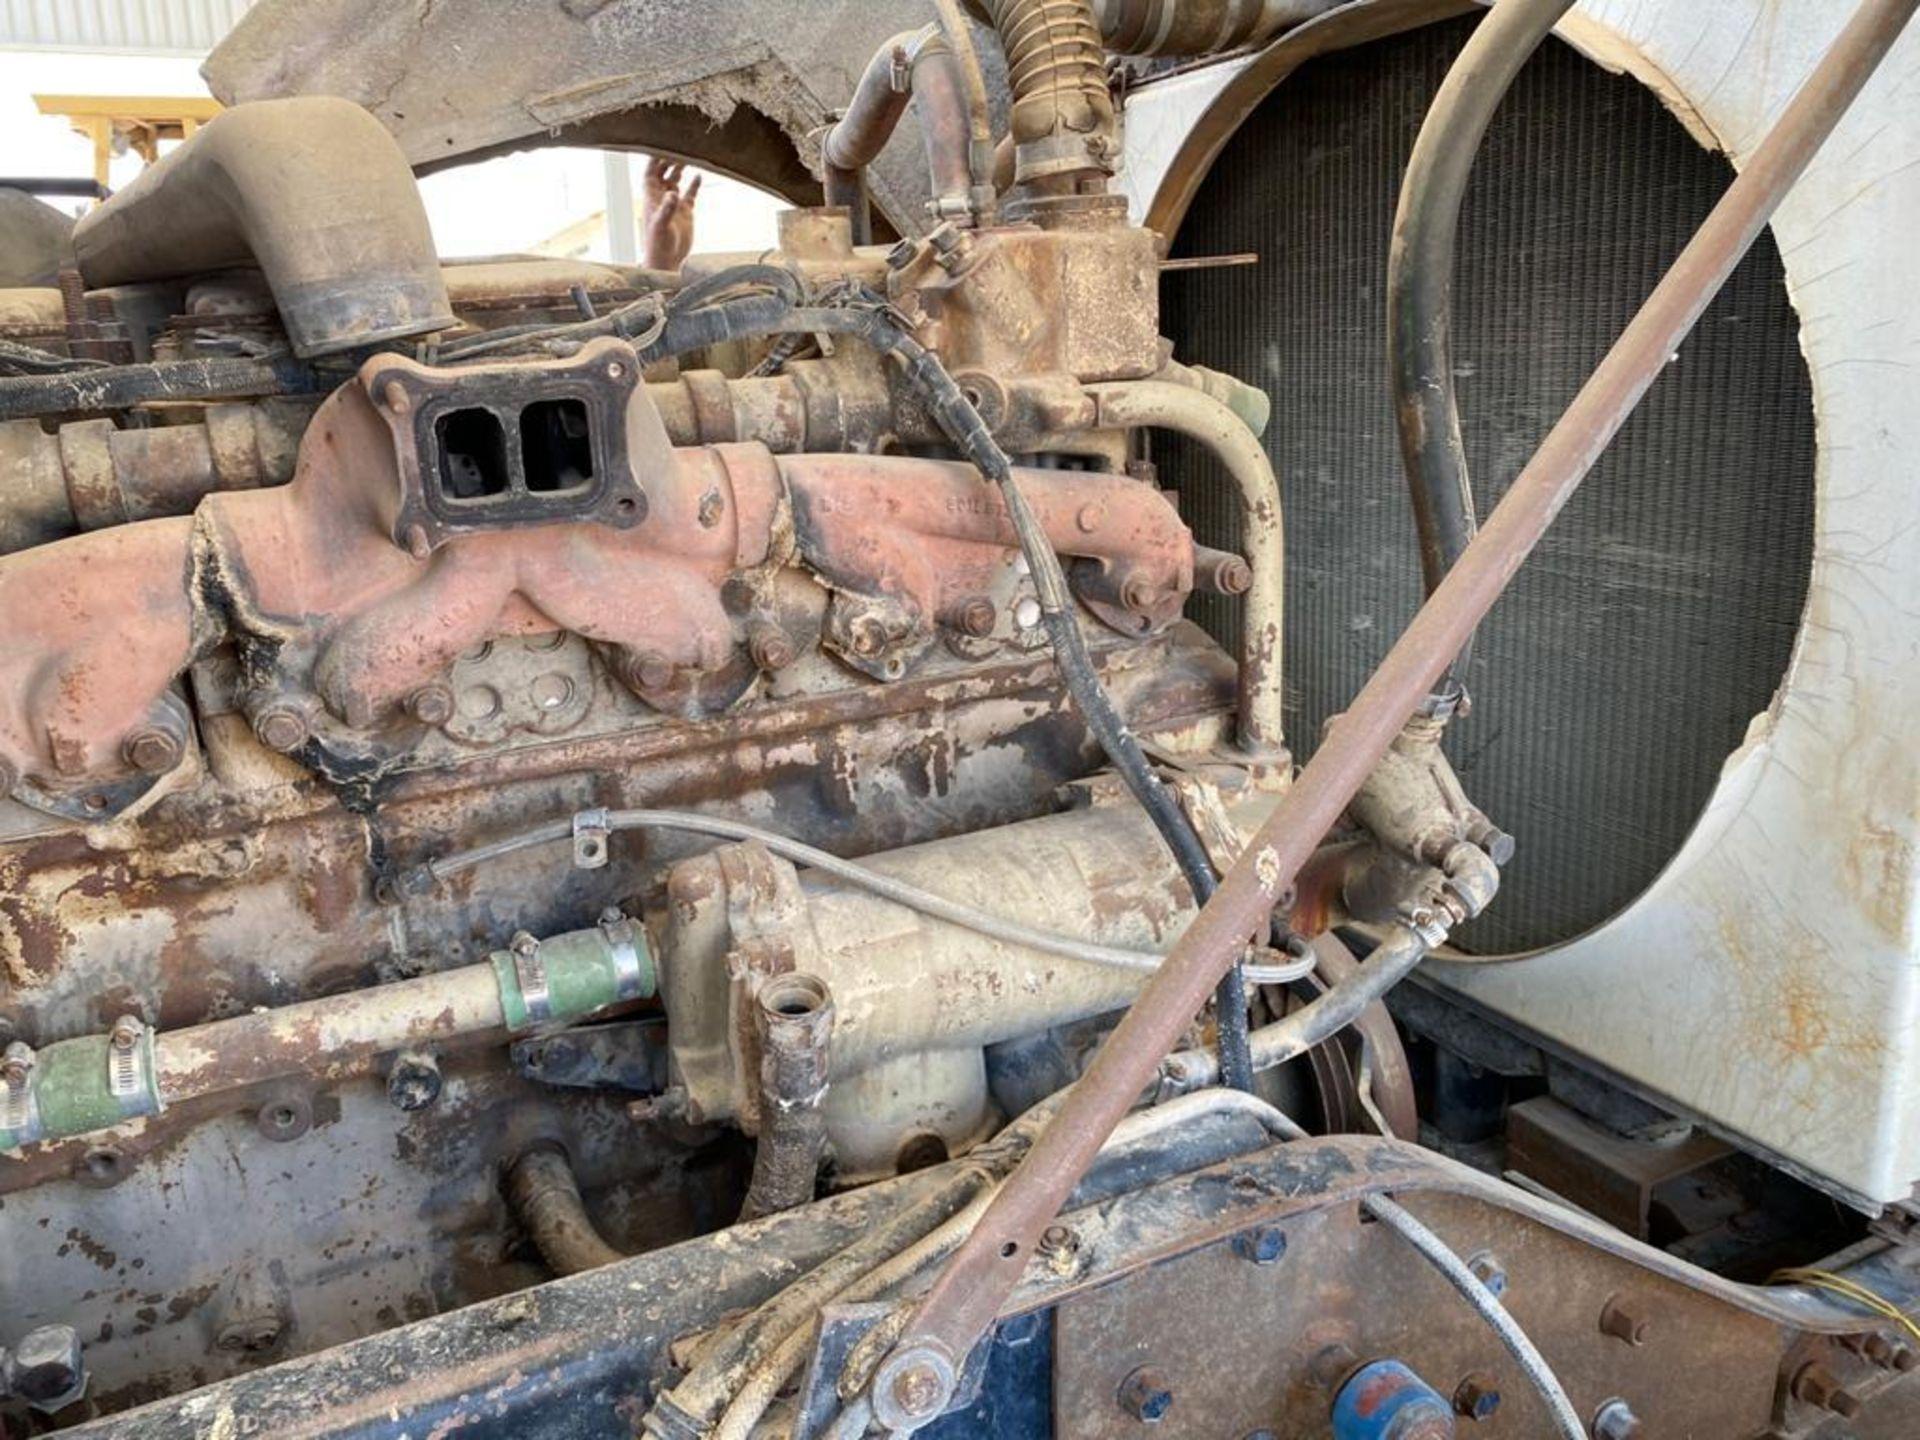 1983 Kenworth Dump Truck, standard transmission of 10 speeds, with Cummins motor - Image 40 of 68